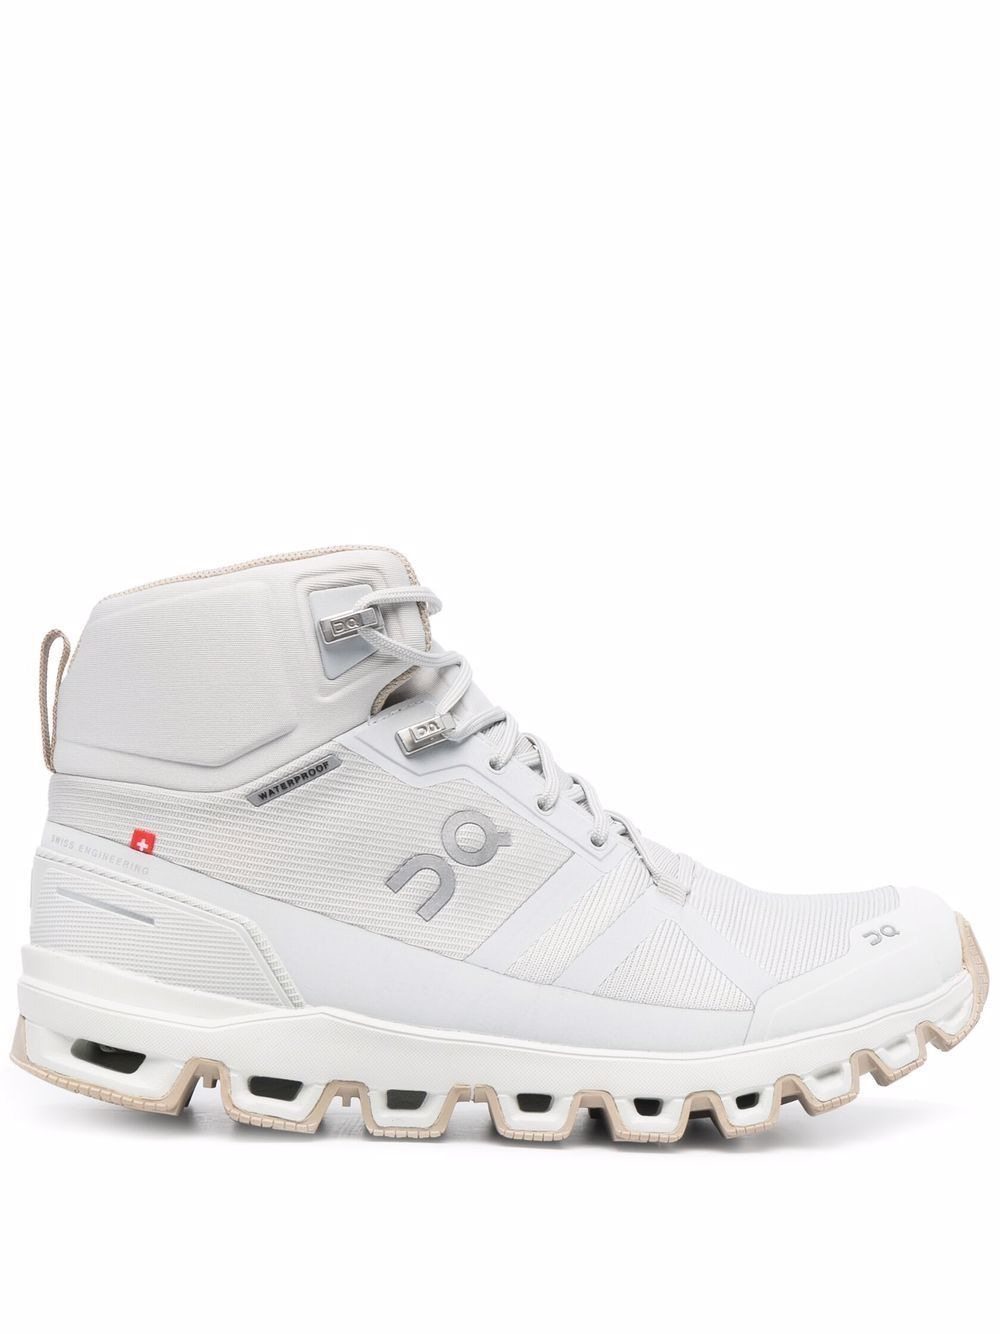 Cloudrock waterproof boots